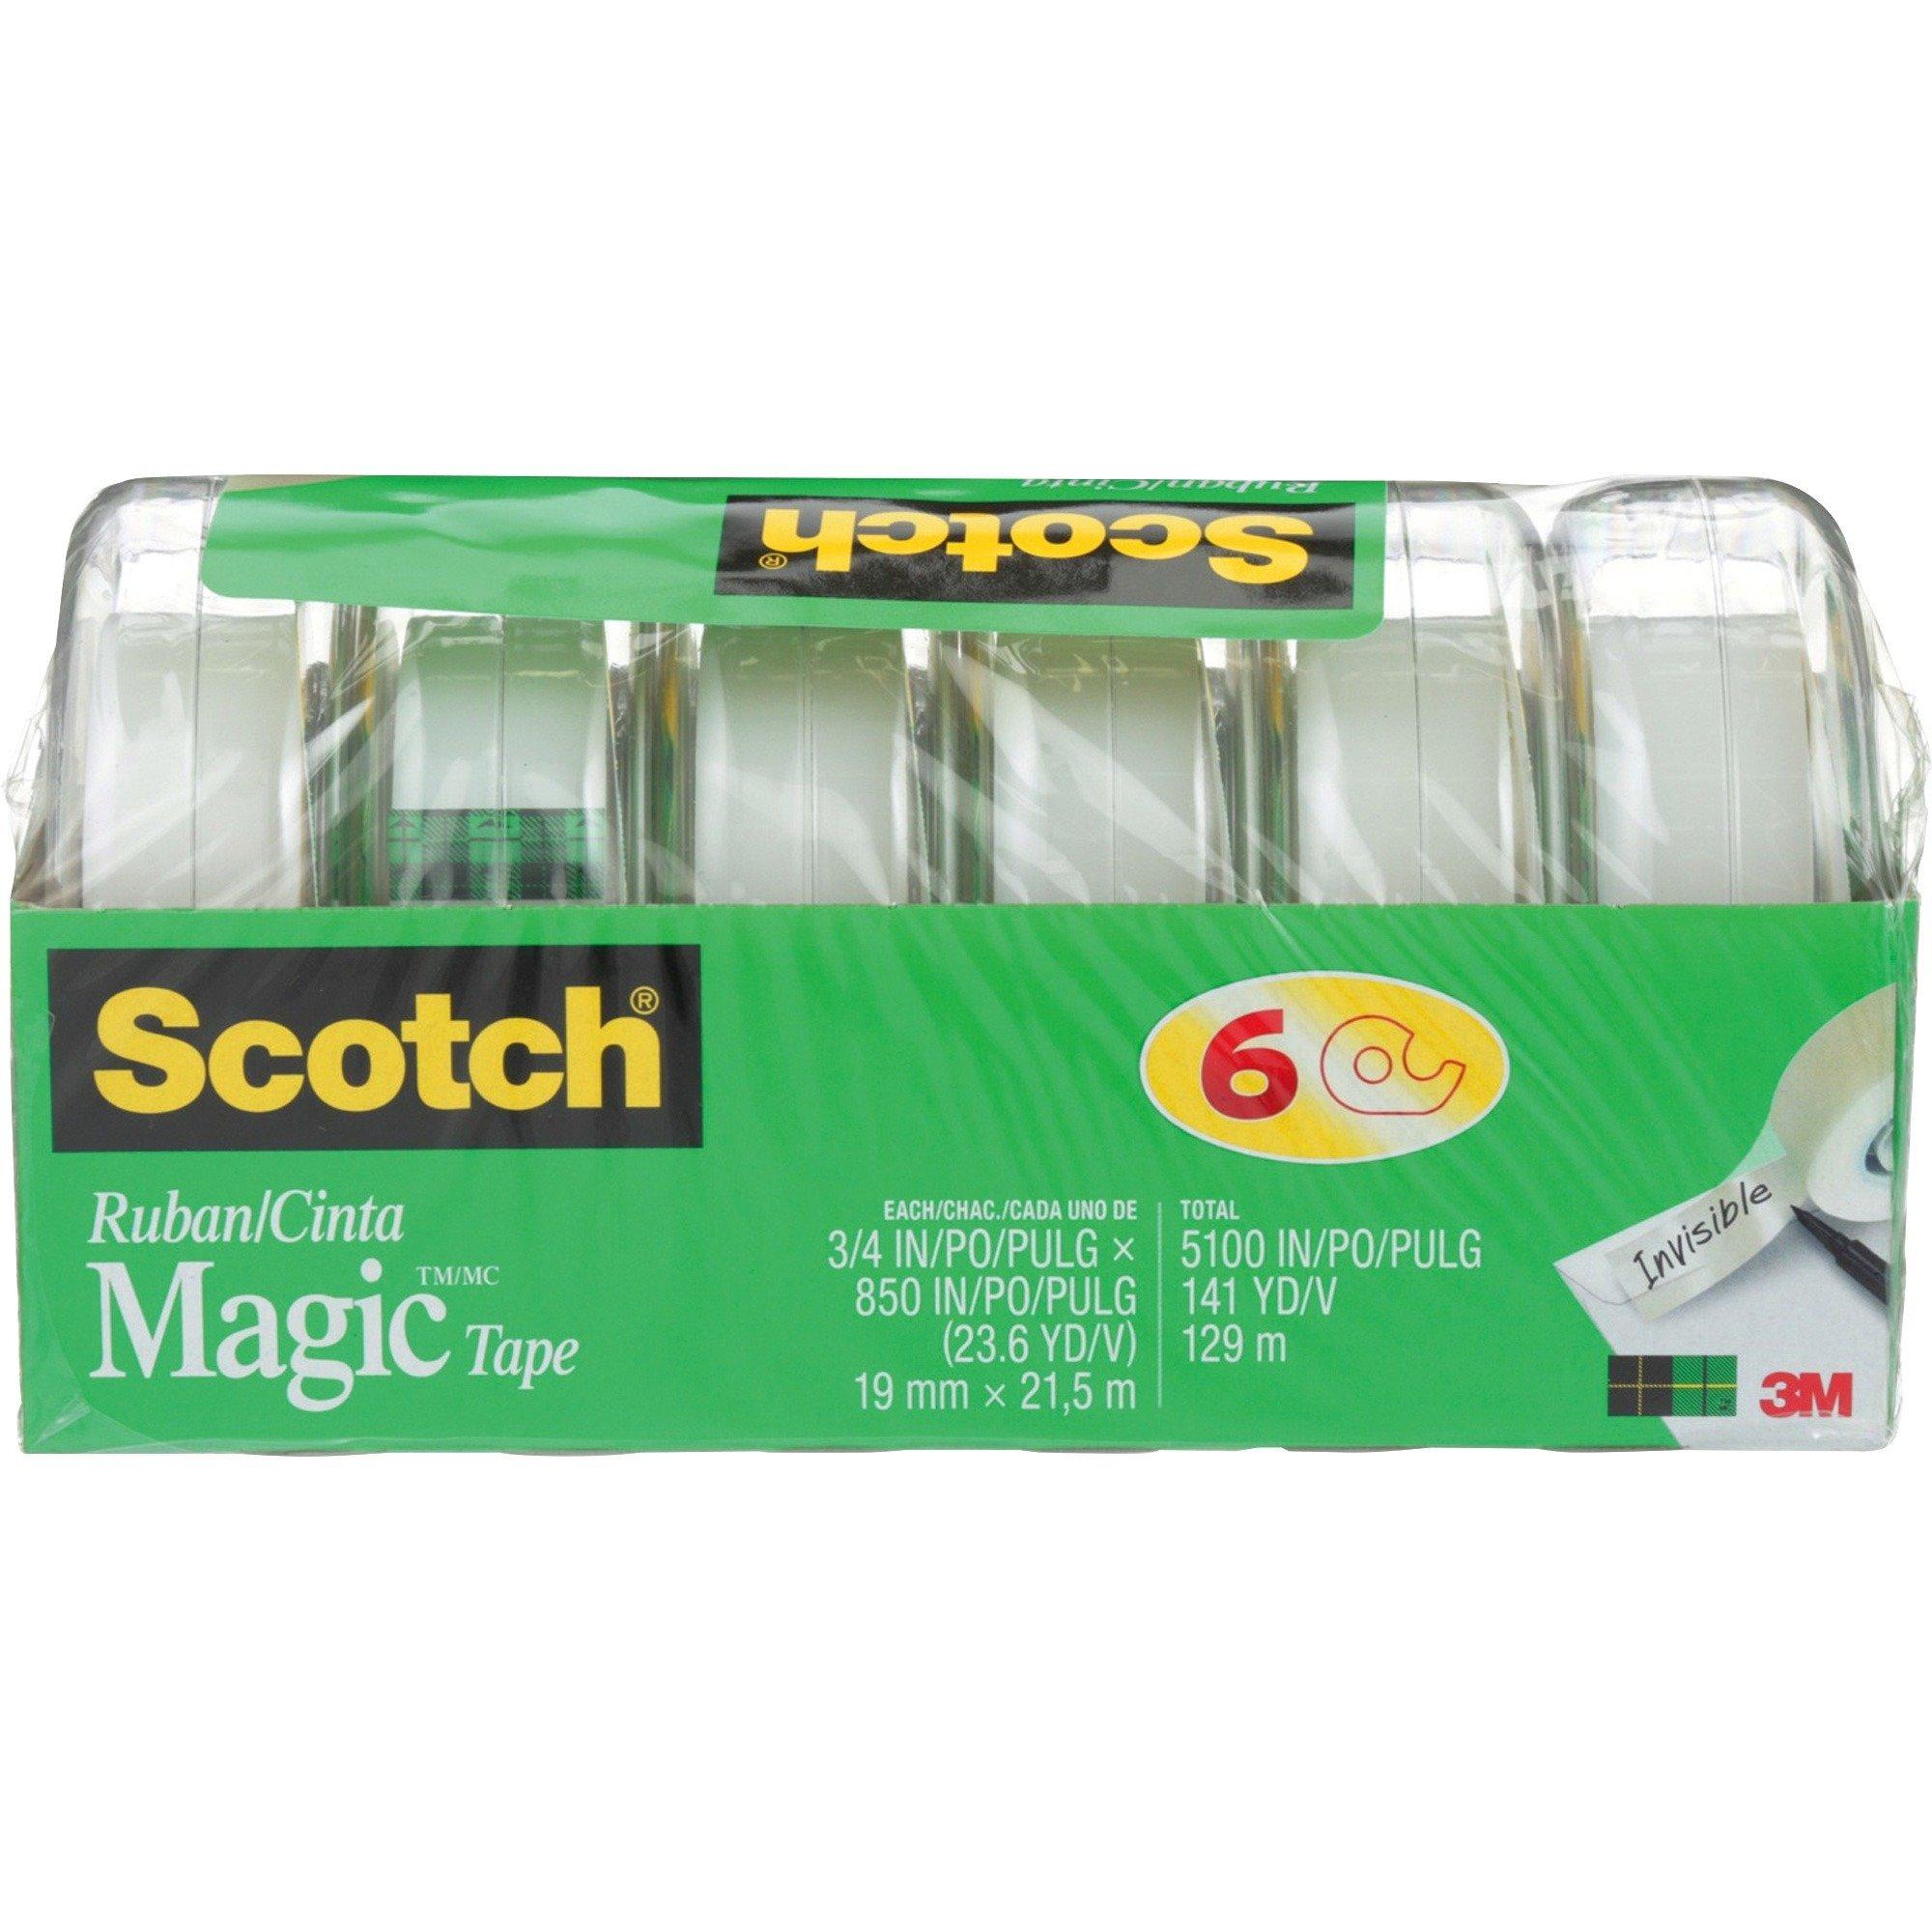 Scotch Magic™ Gift Craft Tape 19mm x 21.5m Length - 6/Pack